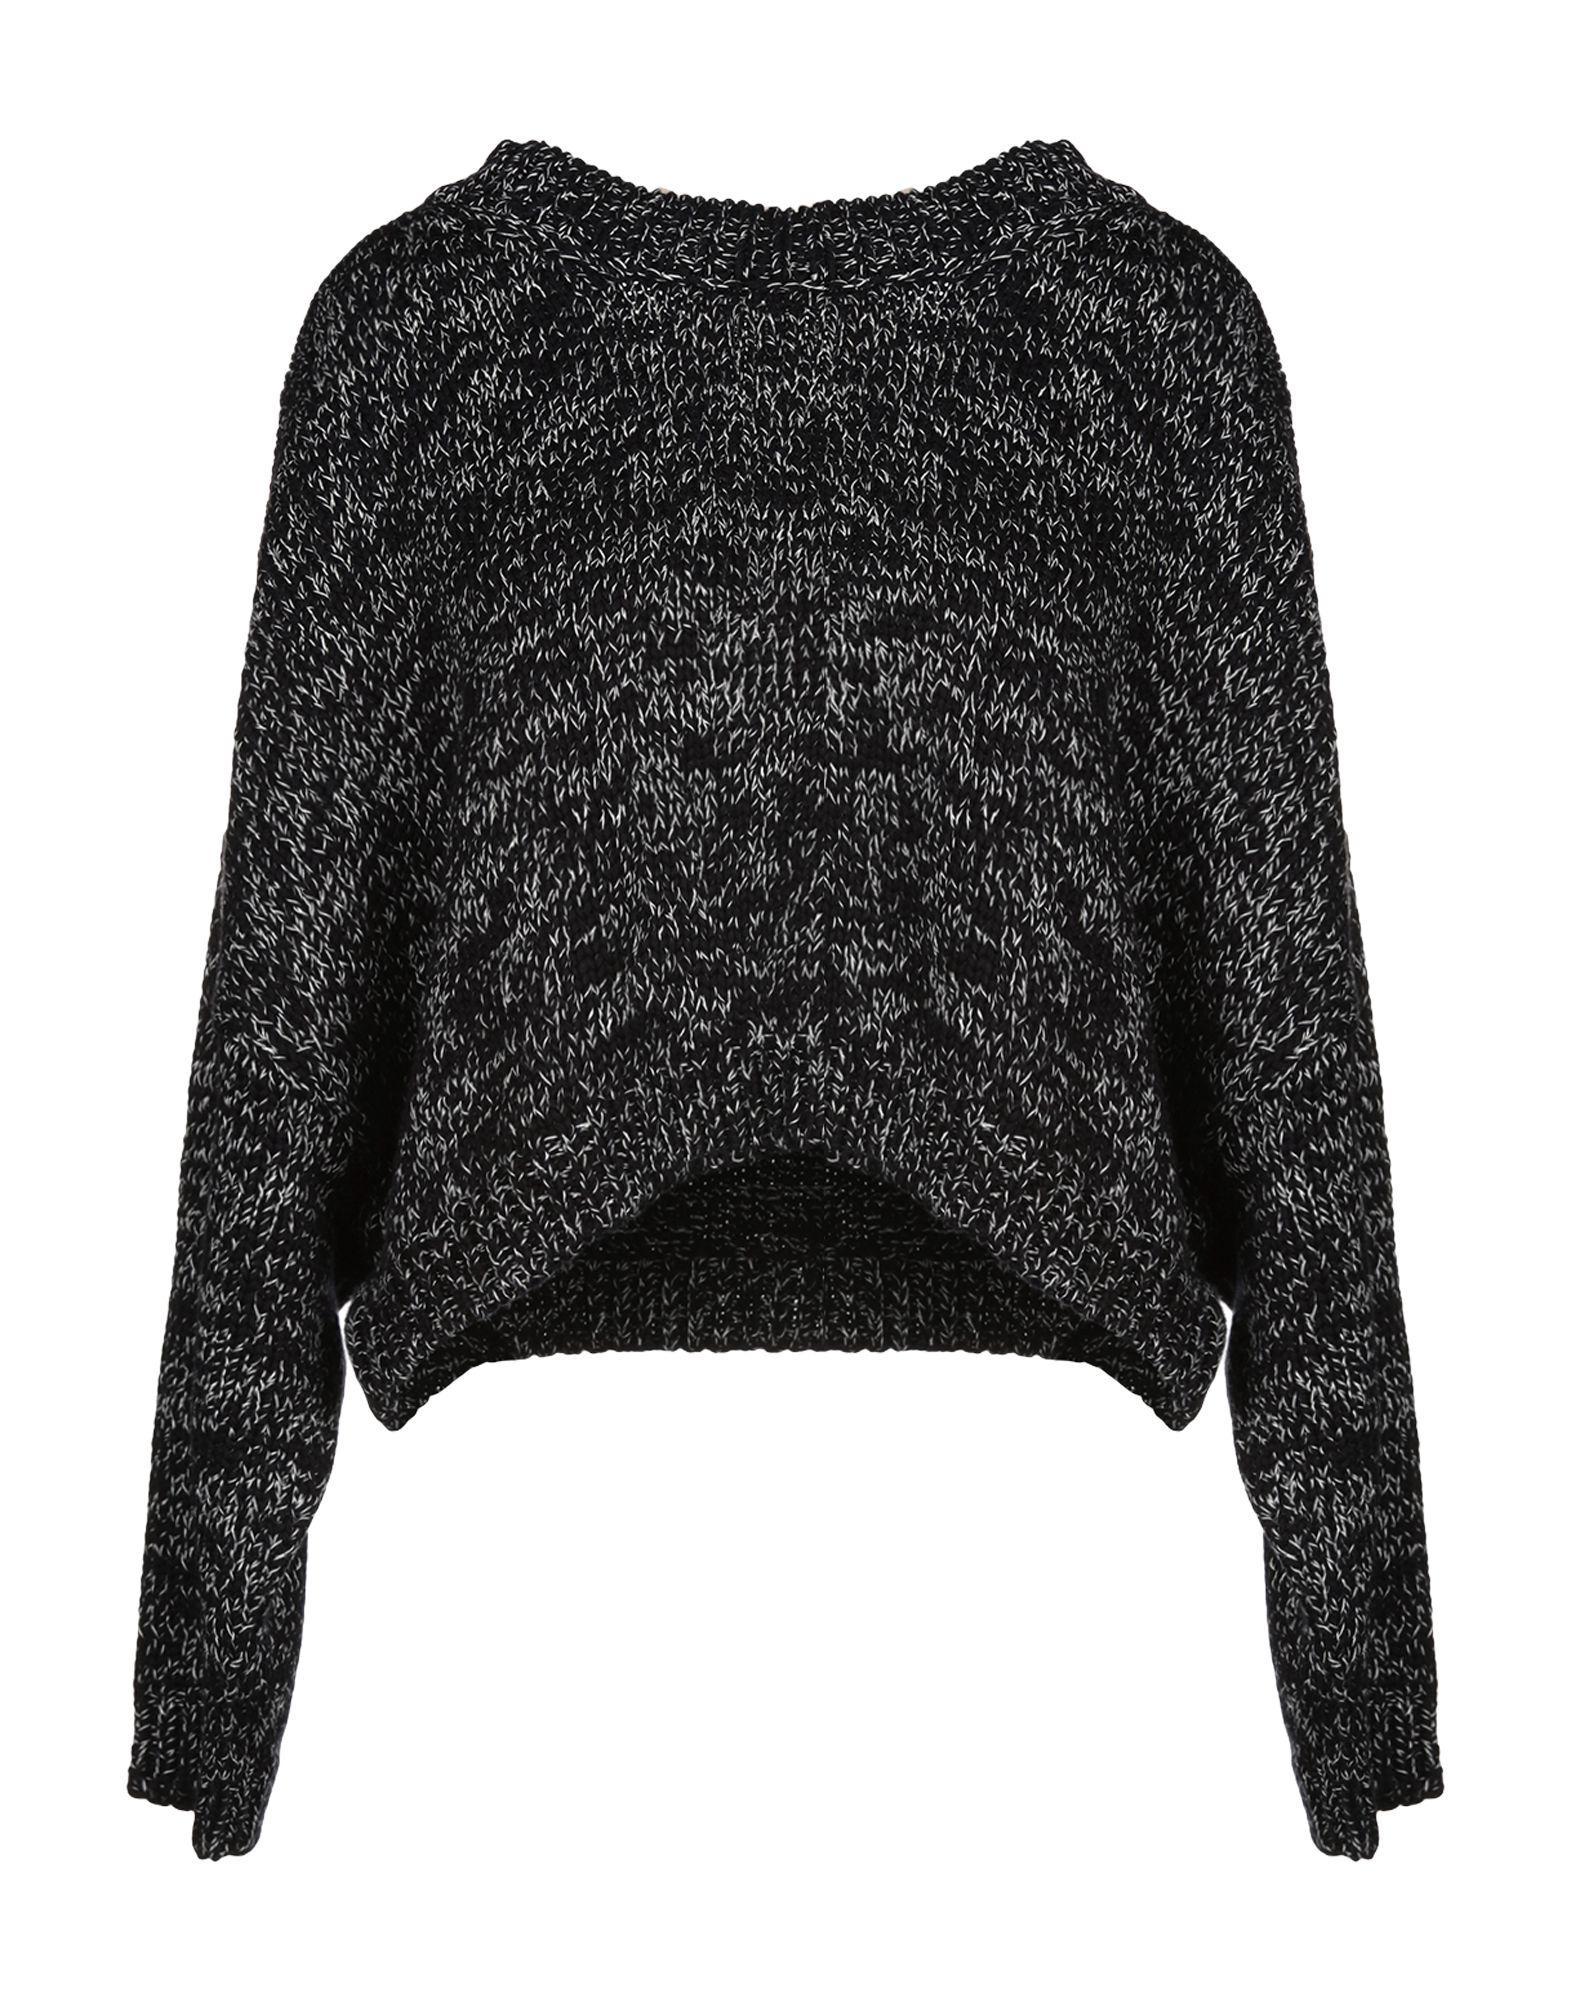 JW ANDERSON Sweaters - Item 39906158